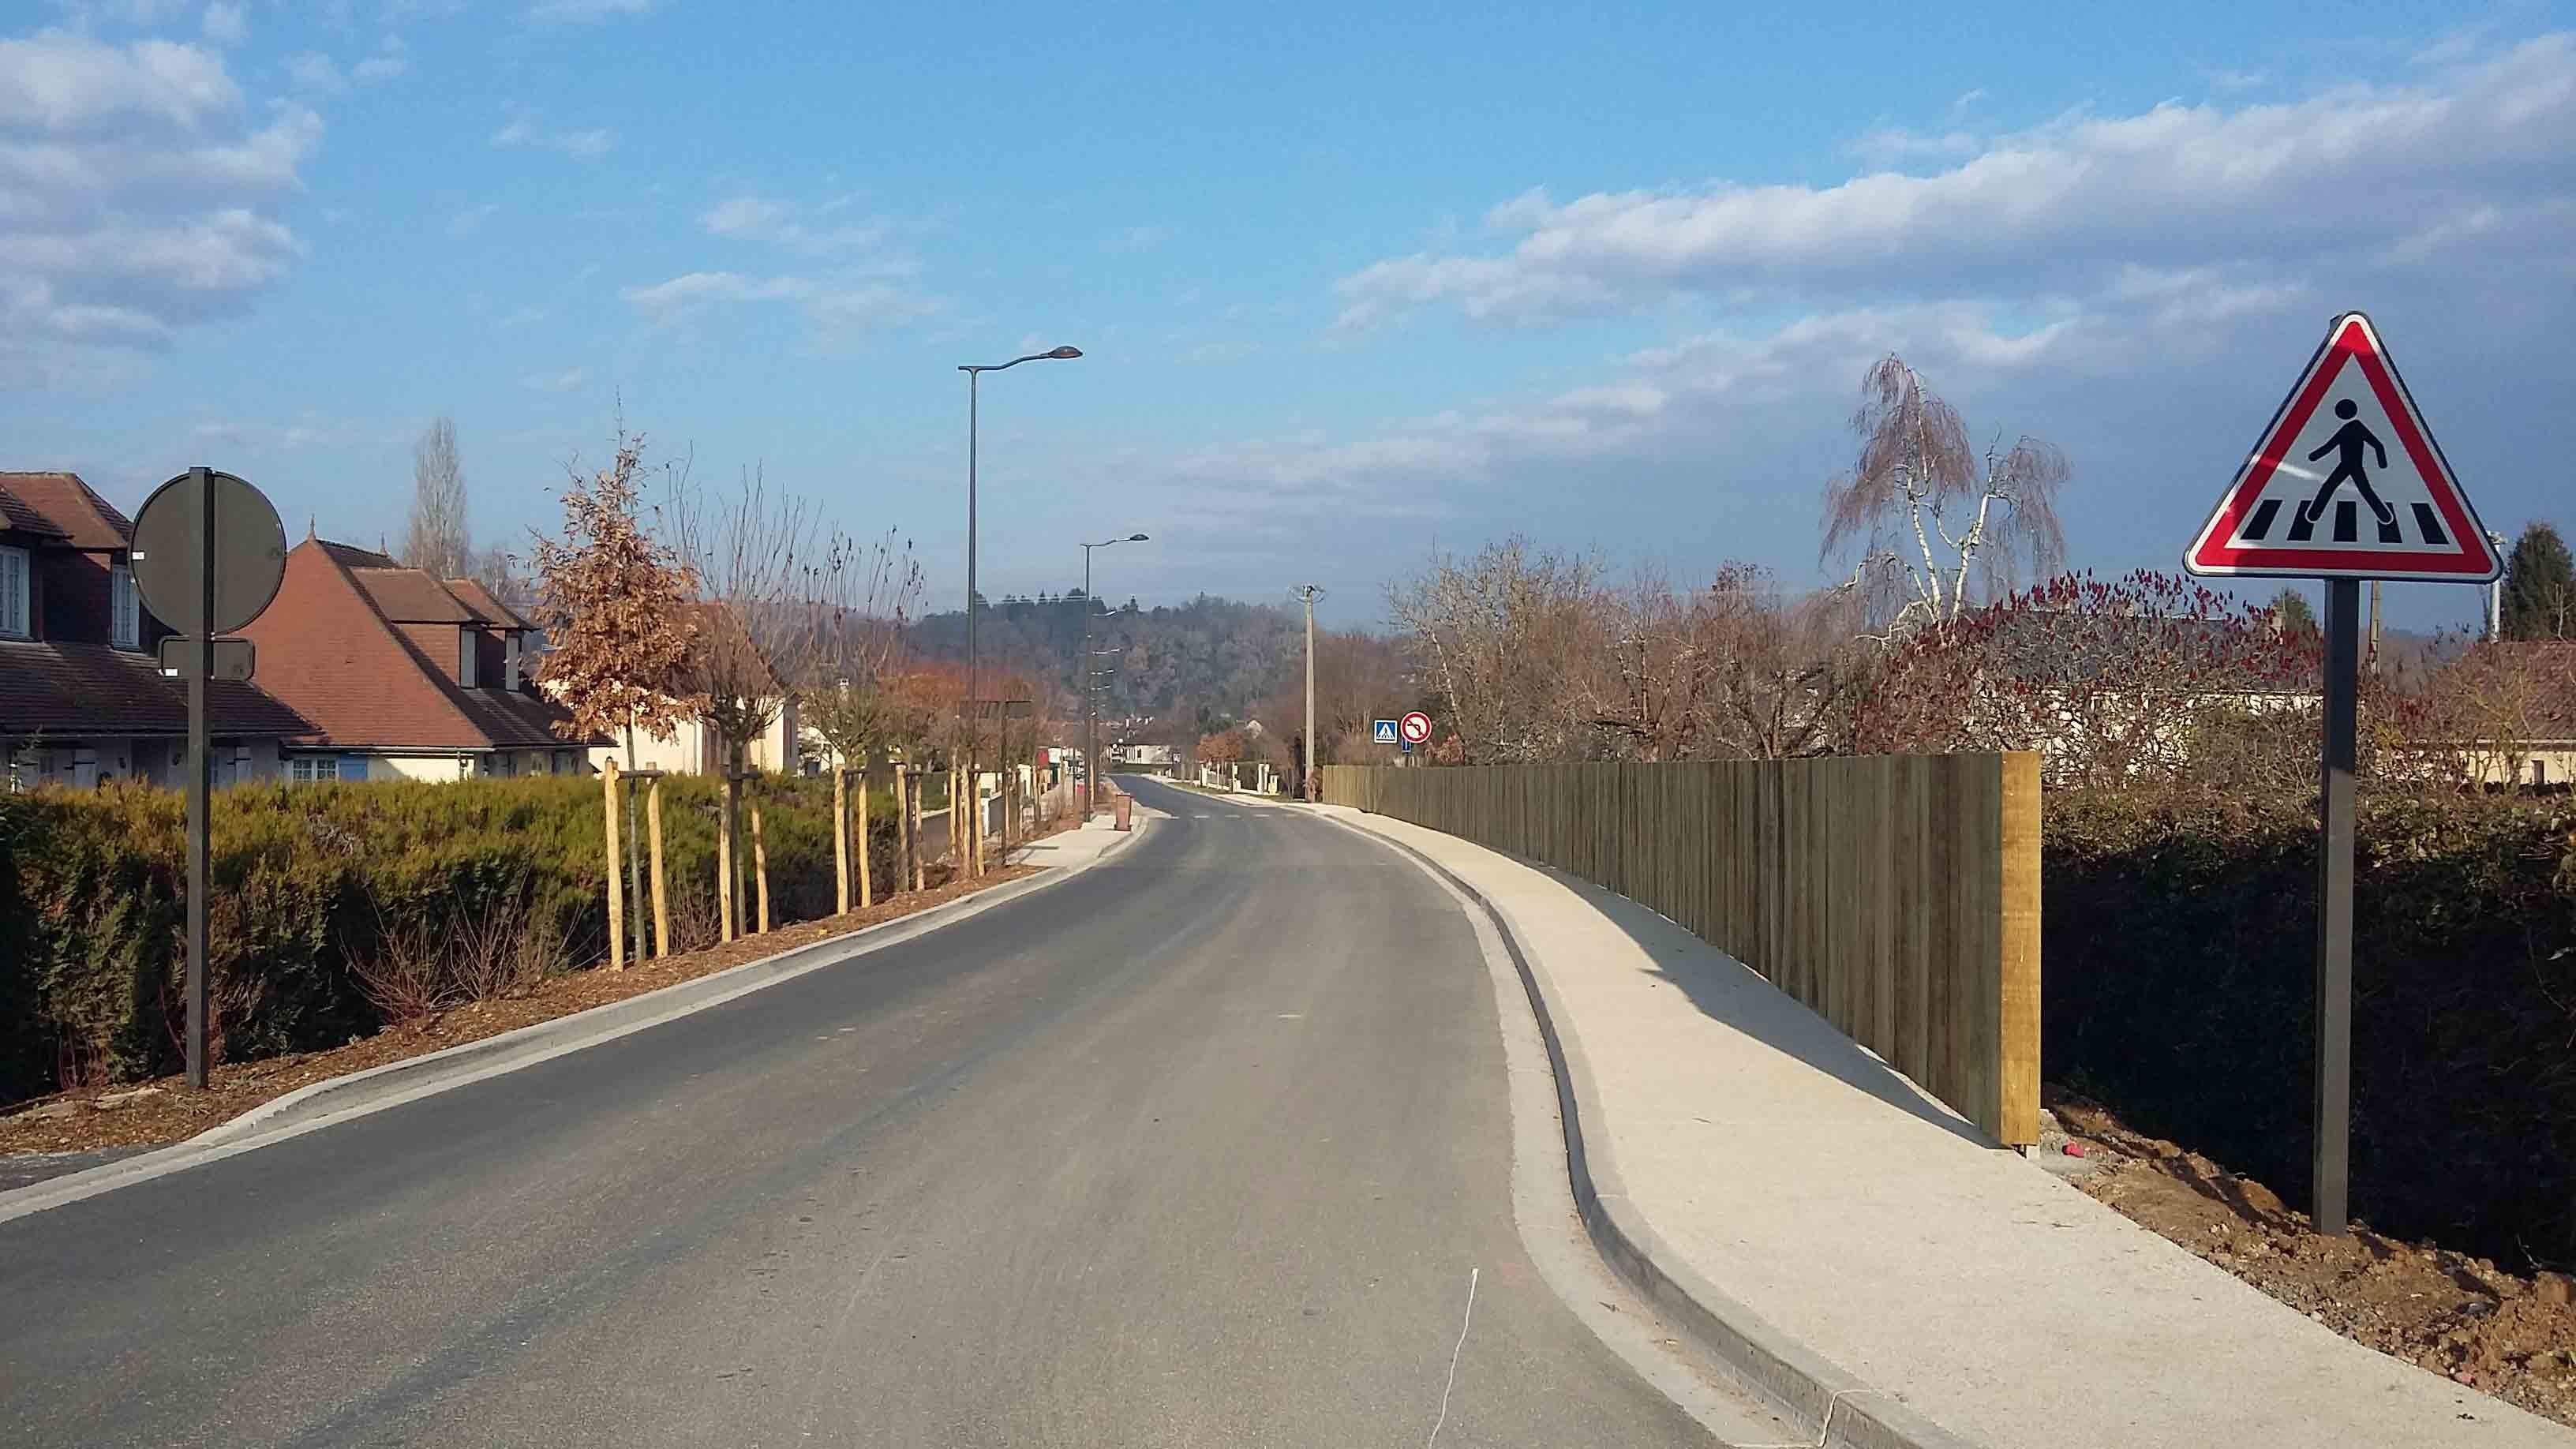 Aménagement urbain voiries Montignac 11